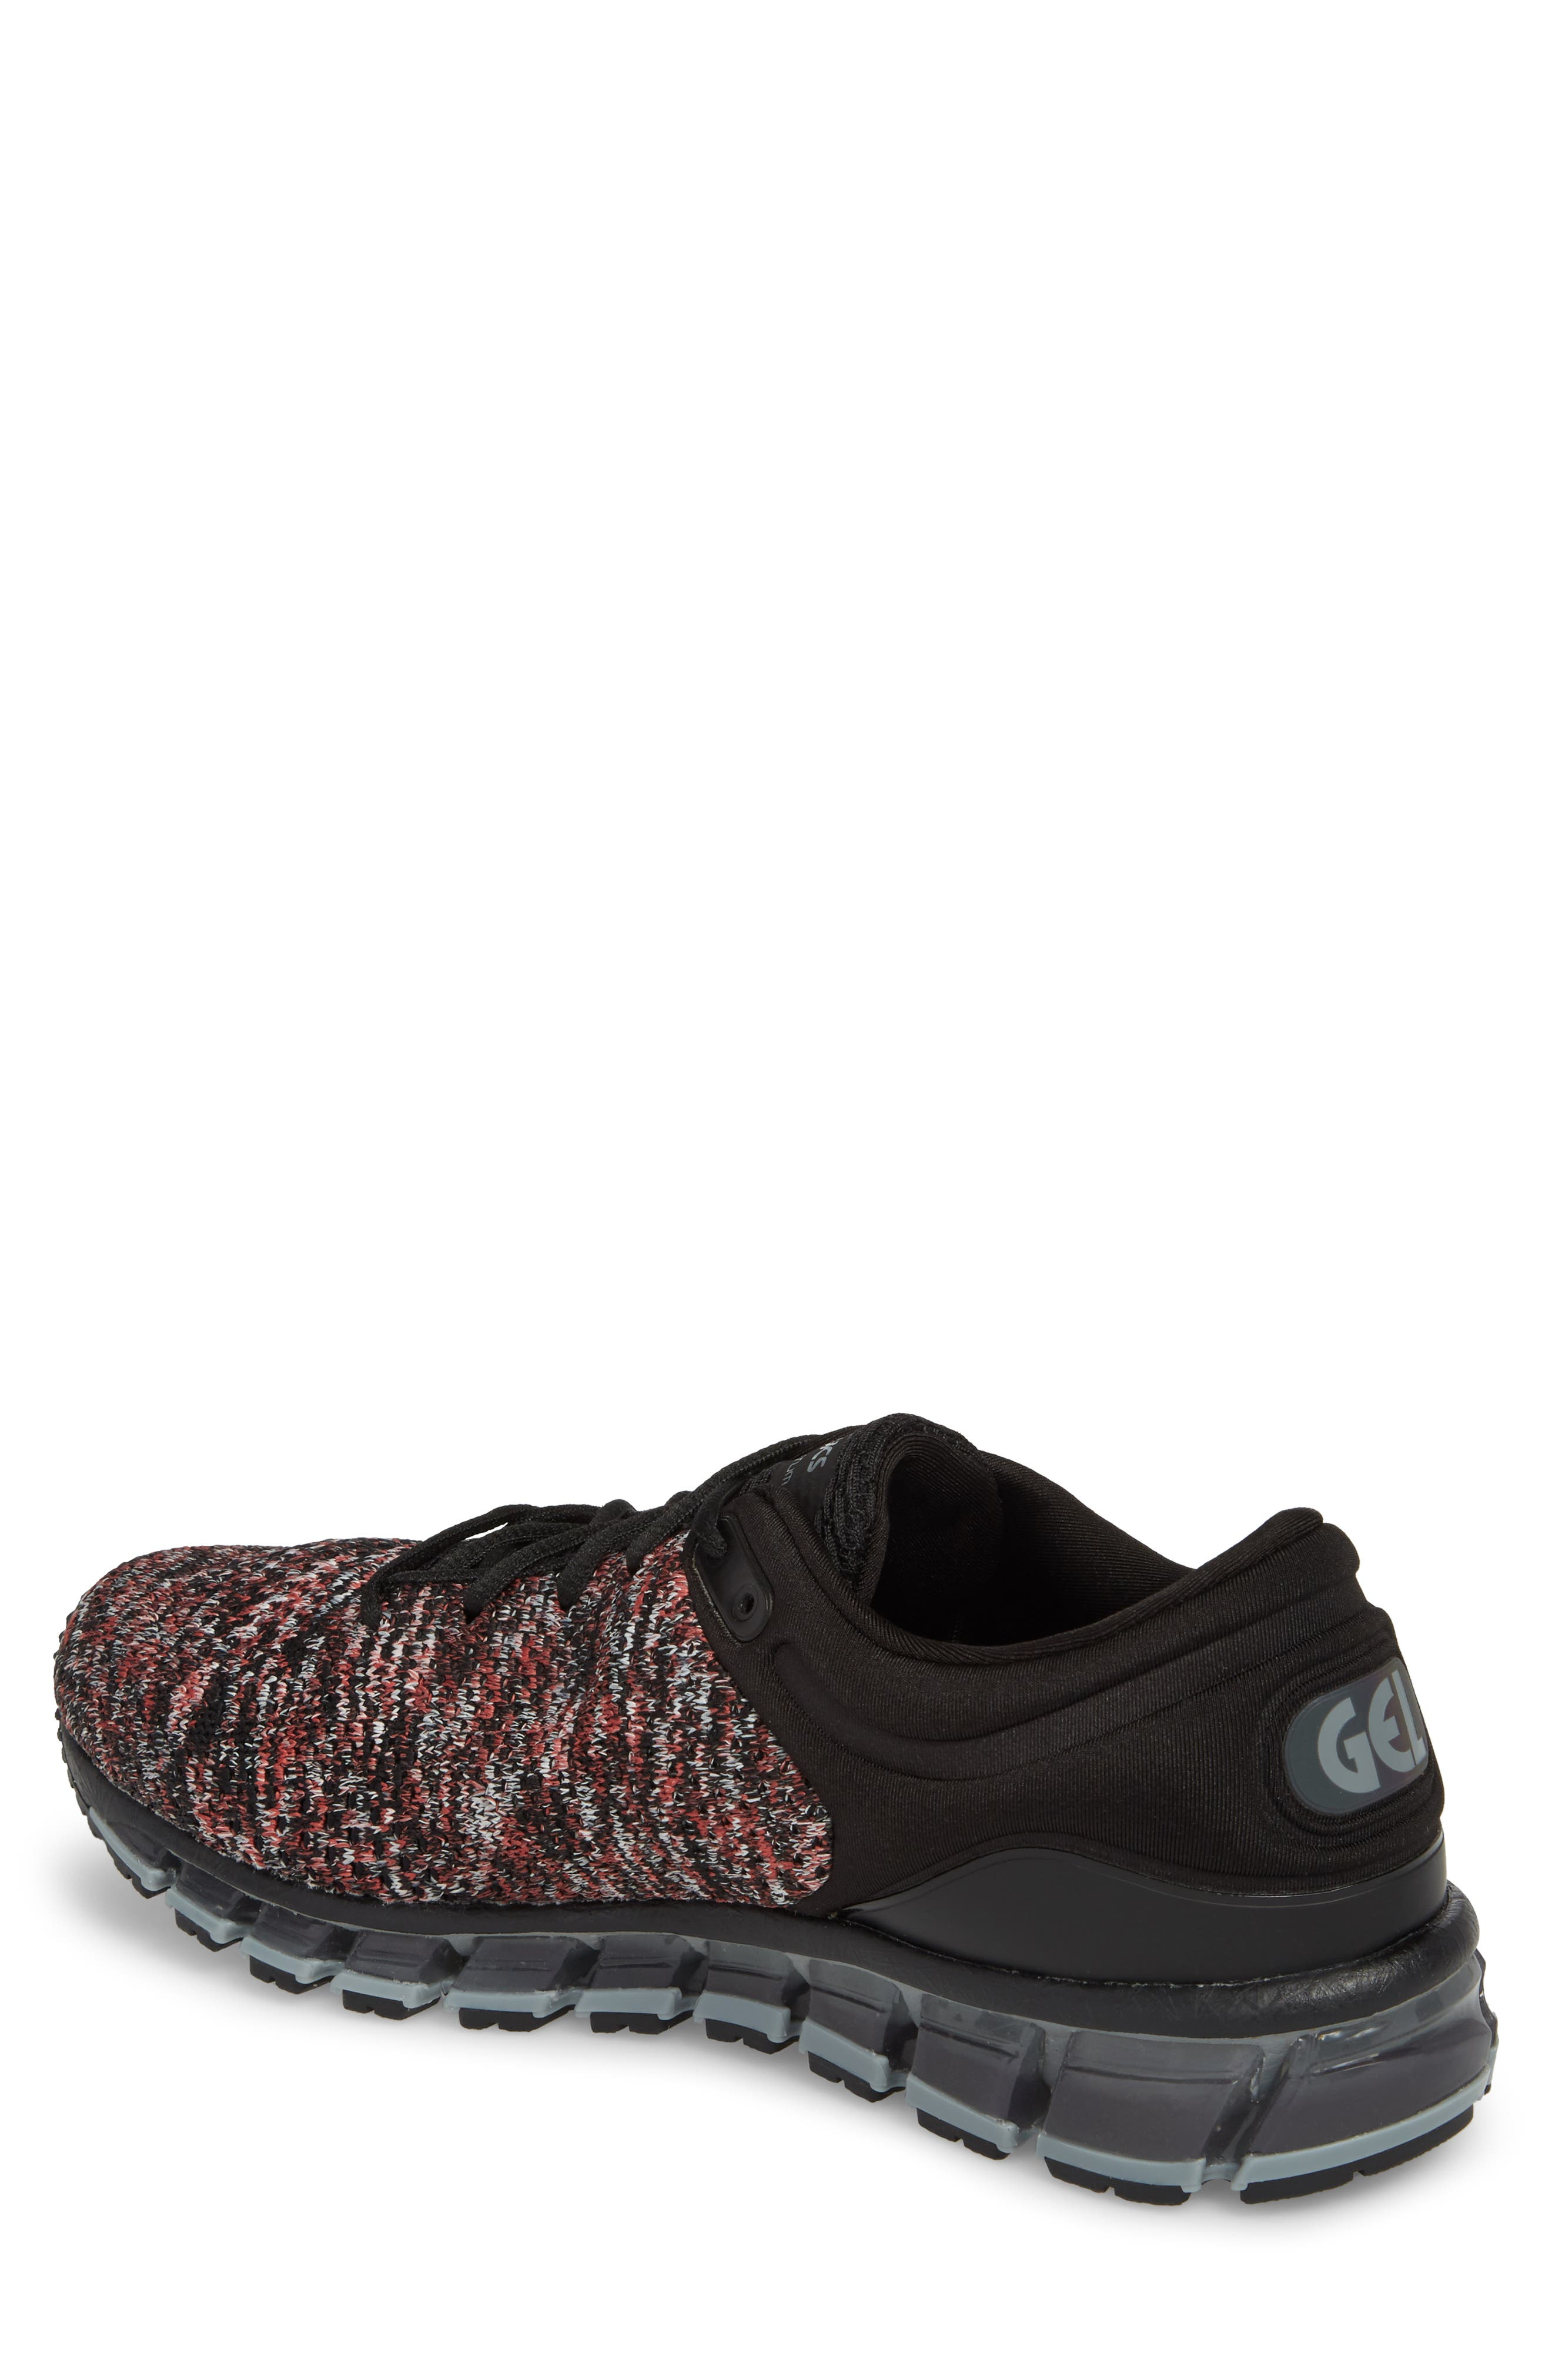 GEL-Quantum 360 Running Shoe,                             Alternate thumbnail 2, color,                             Black/ Class Red